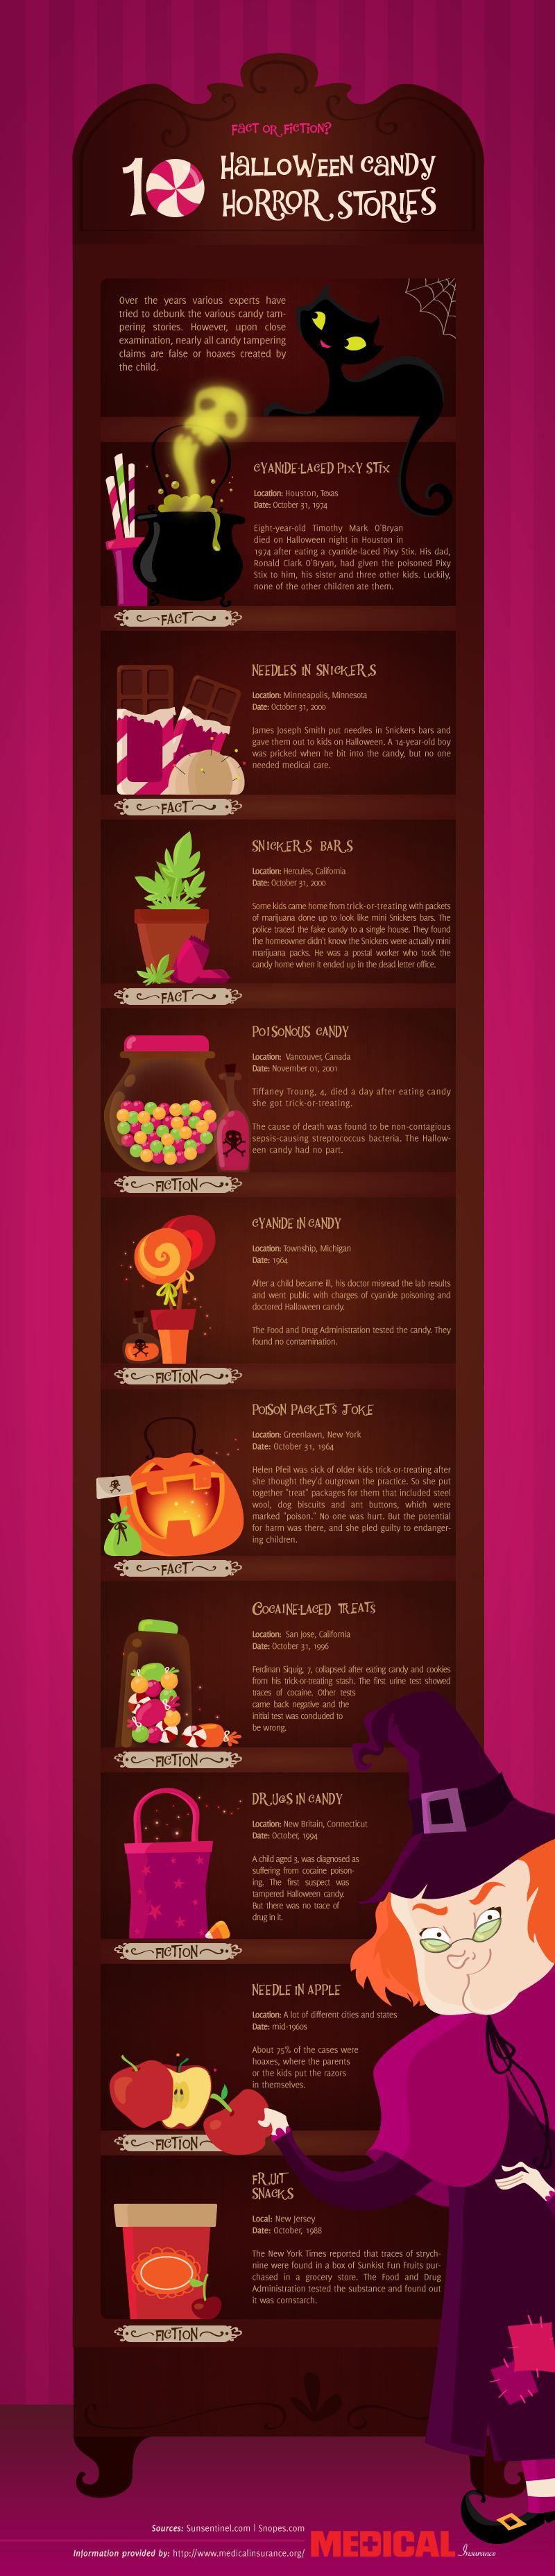 Halloween Candy Horror Stories